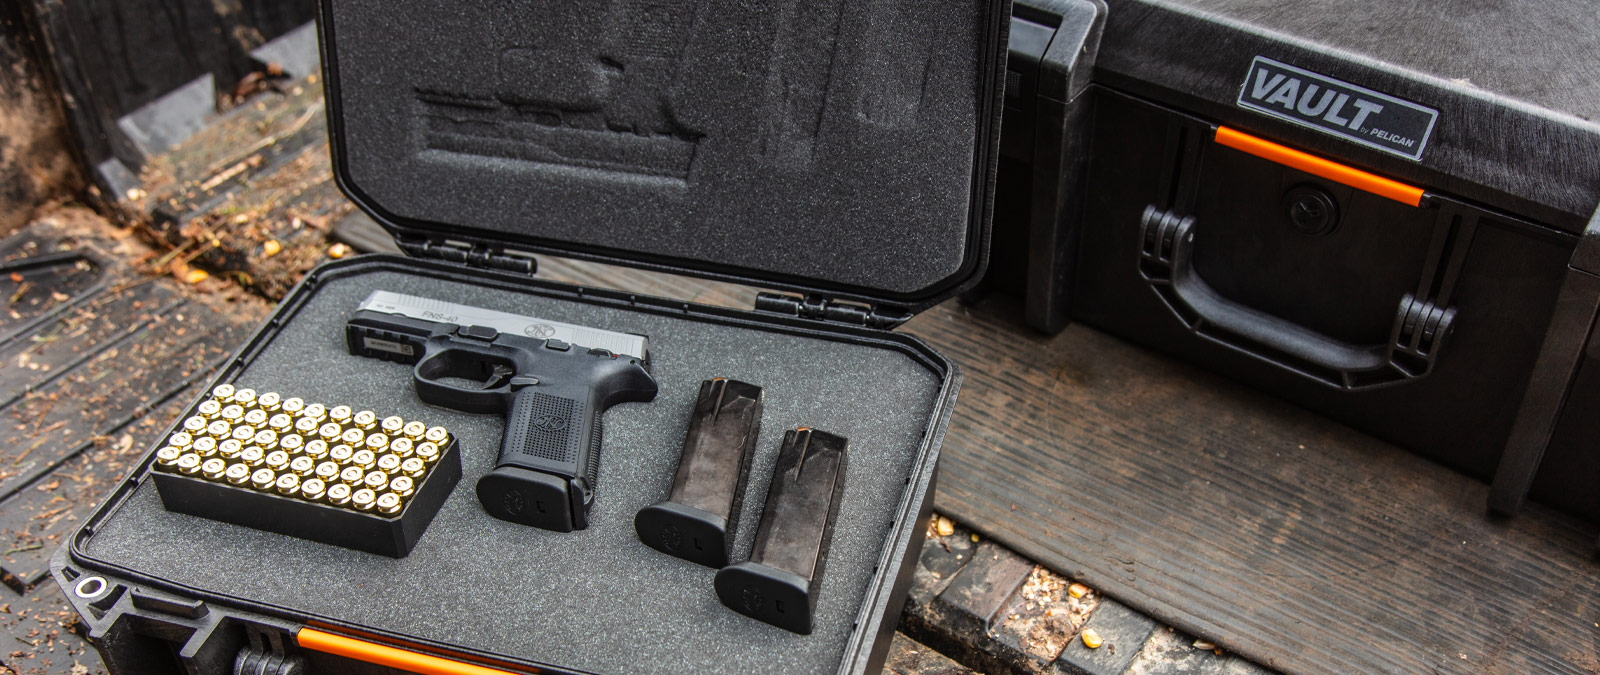 pelican consumer blog handgun shipment safety